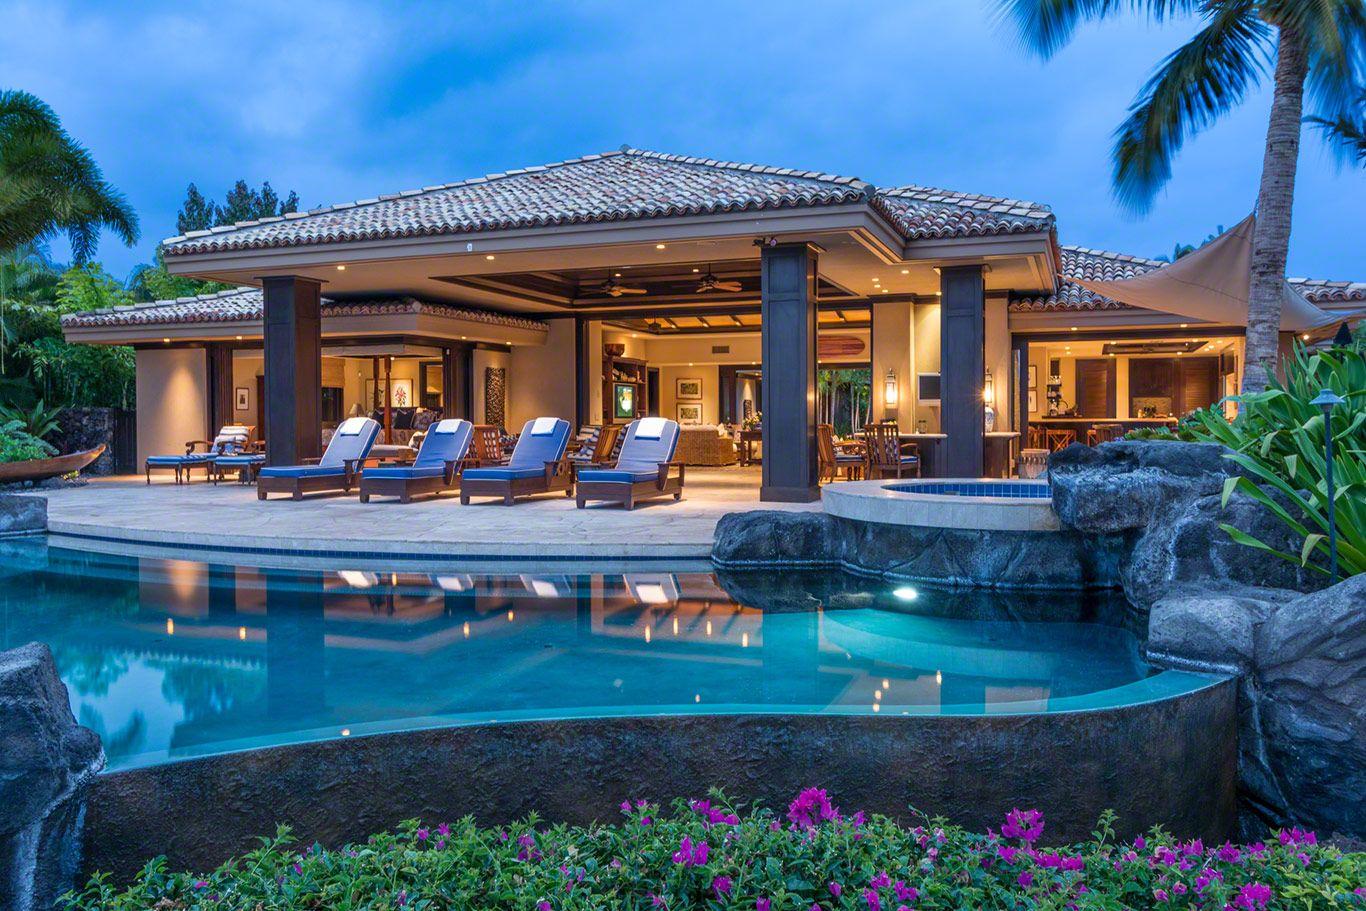 Hawaii Villas Hawaii Vacation Rentals Luxury Retreats Luxury Beach House Beach House Design Hawaii Homes